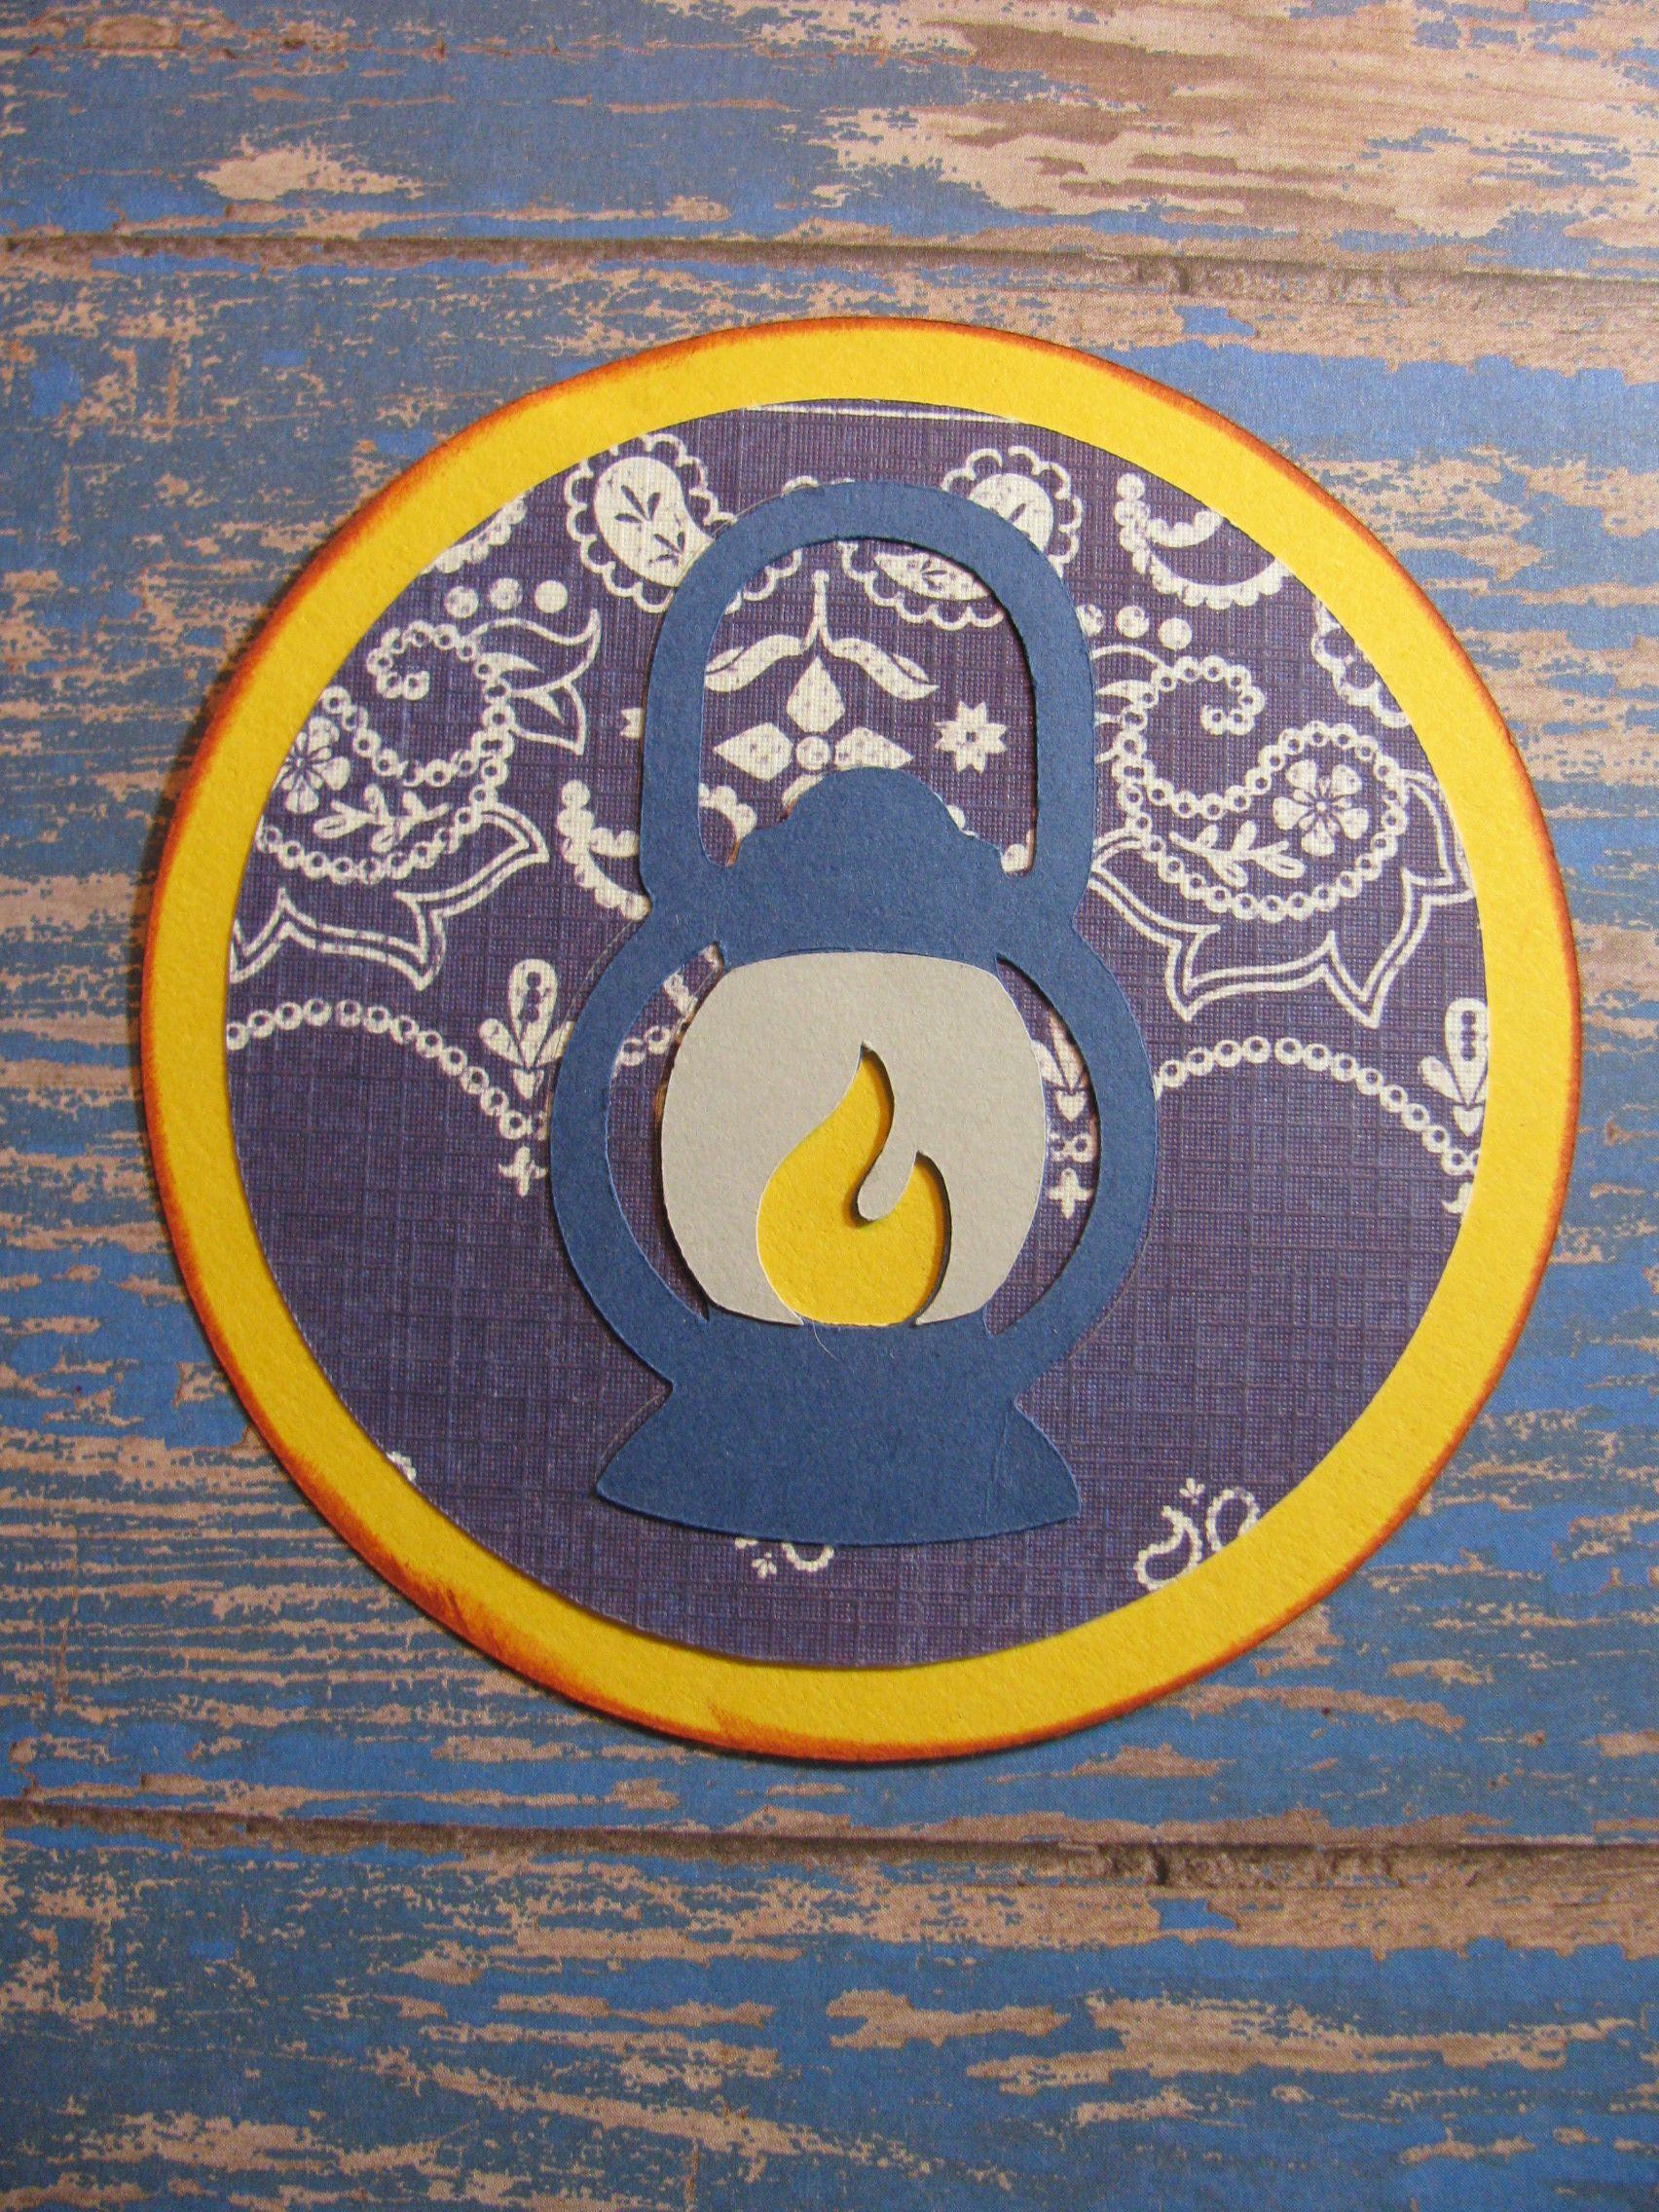 Campin Critters Badge - Lantern